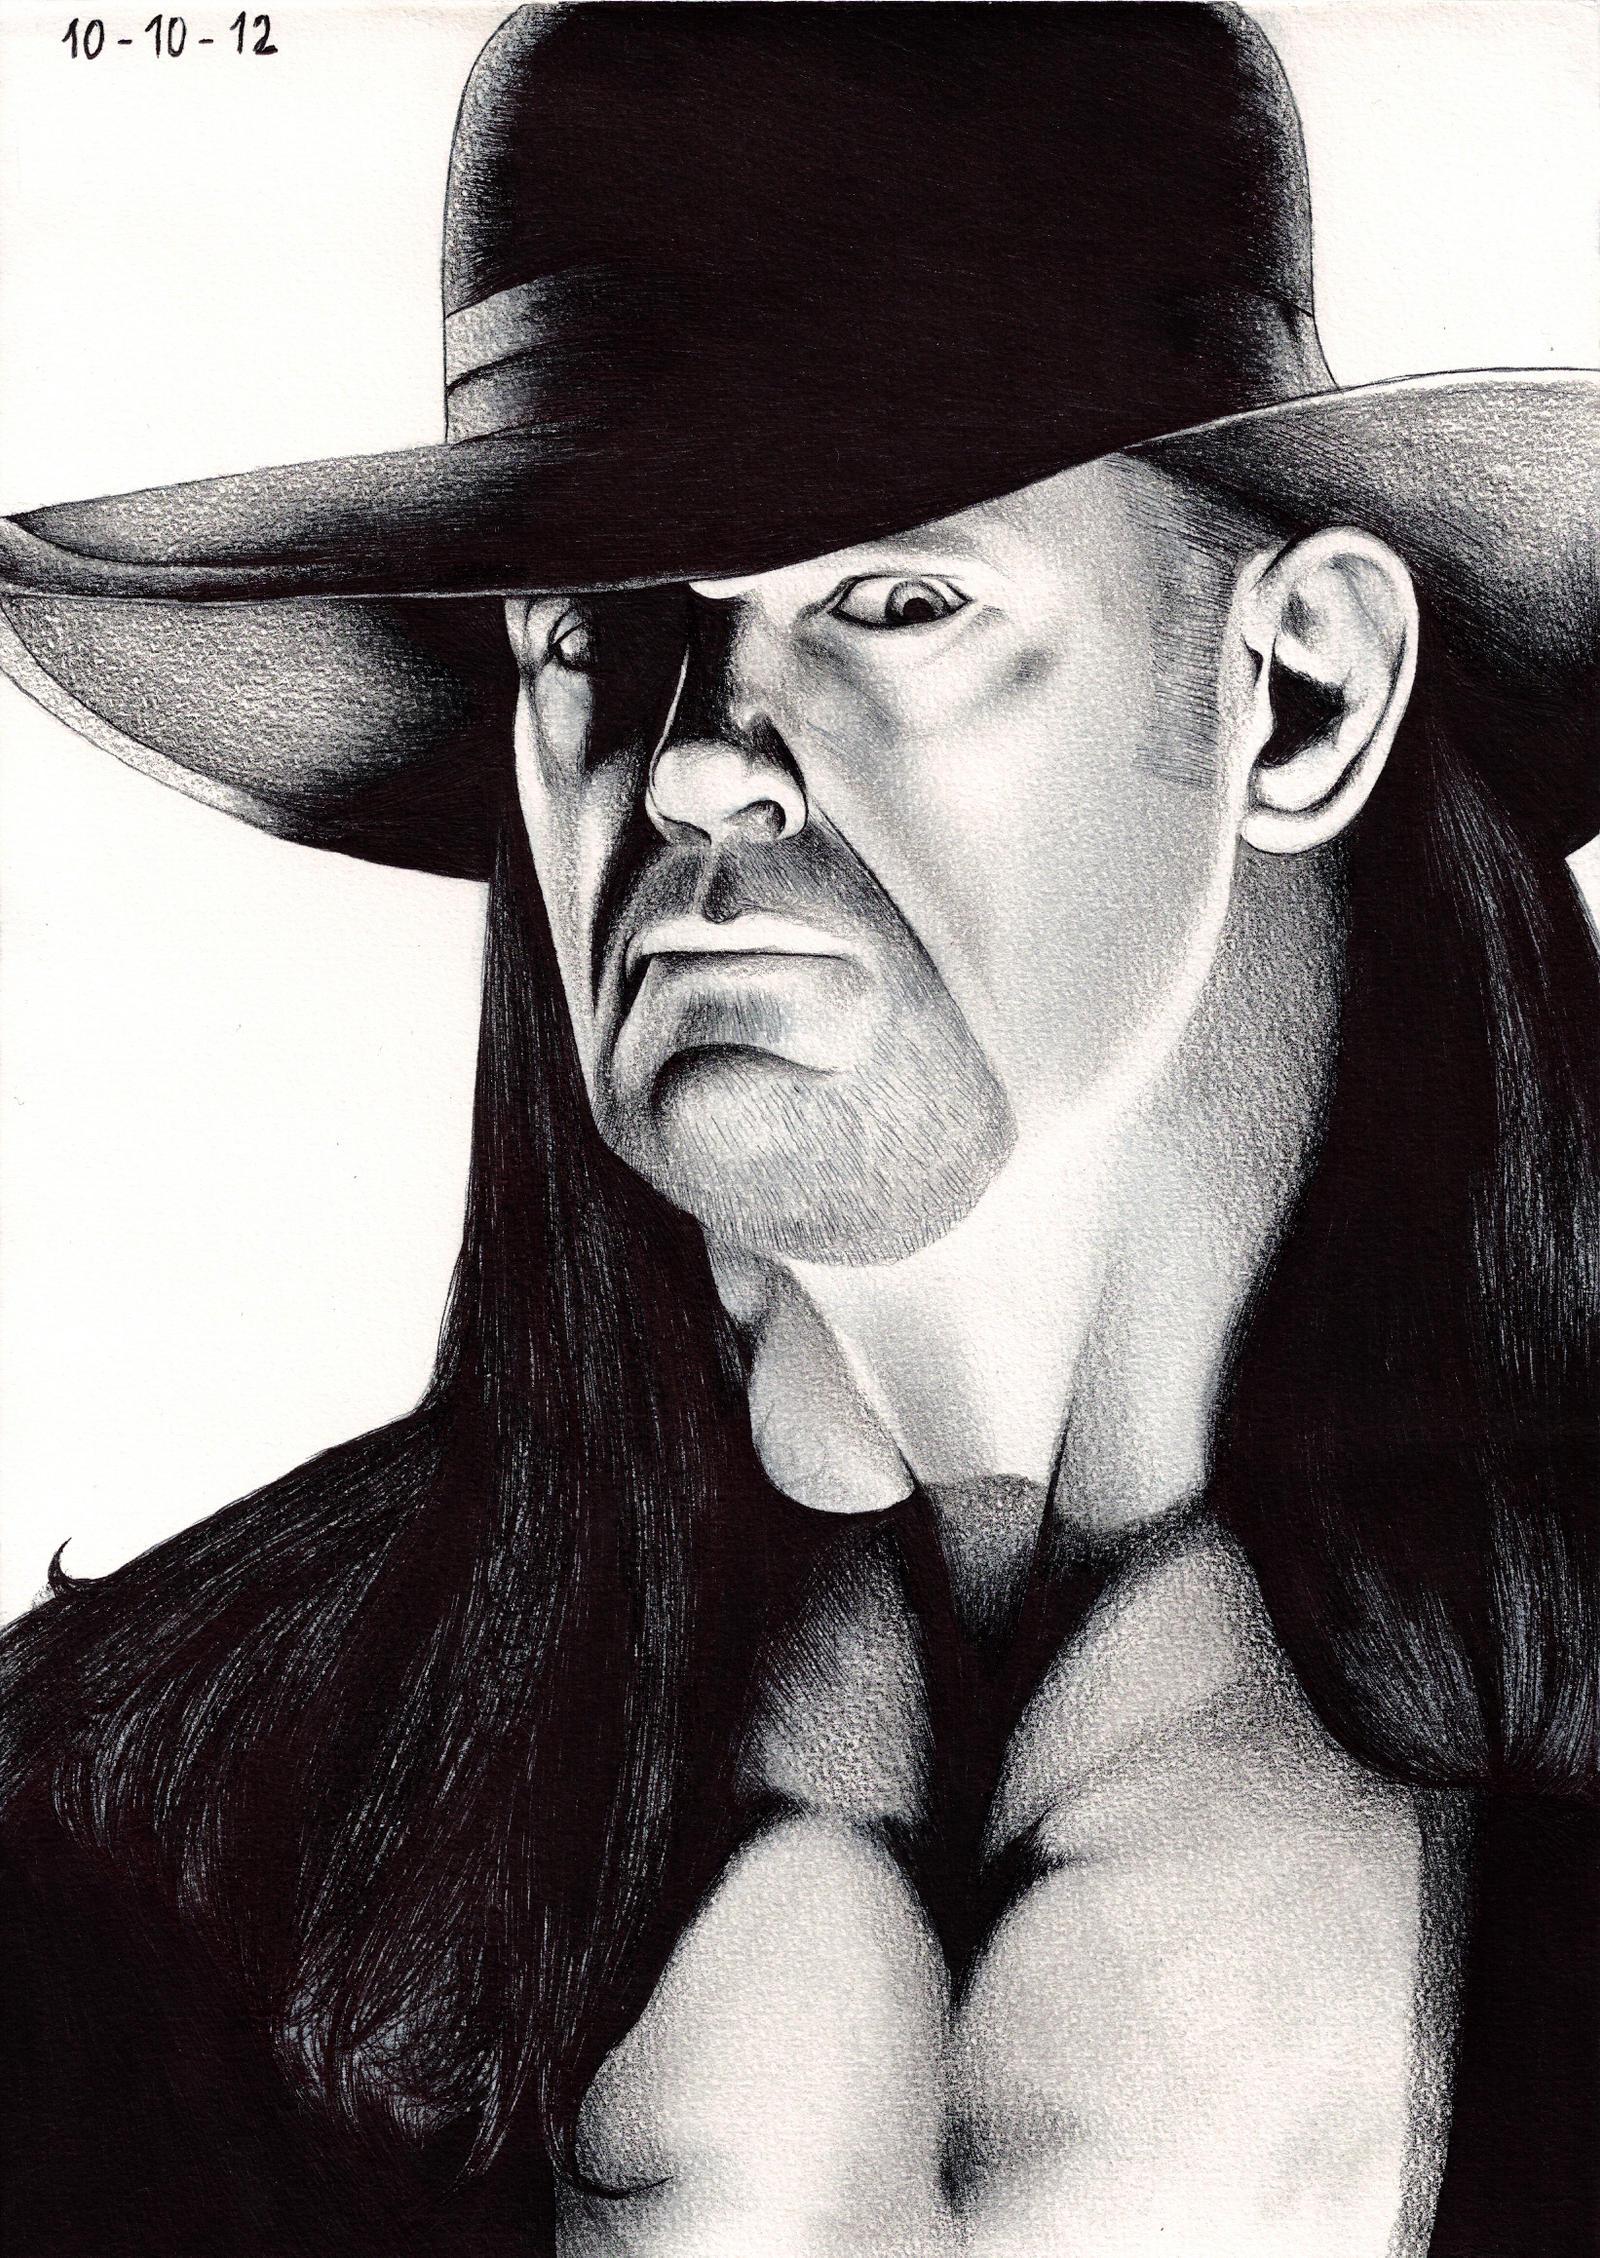 The Undertaker by tyller16